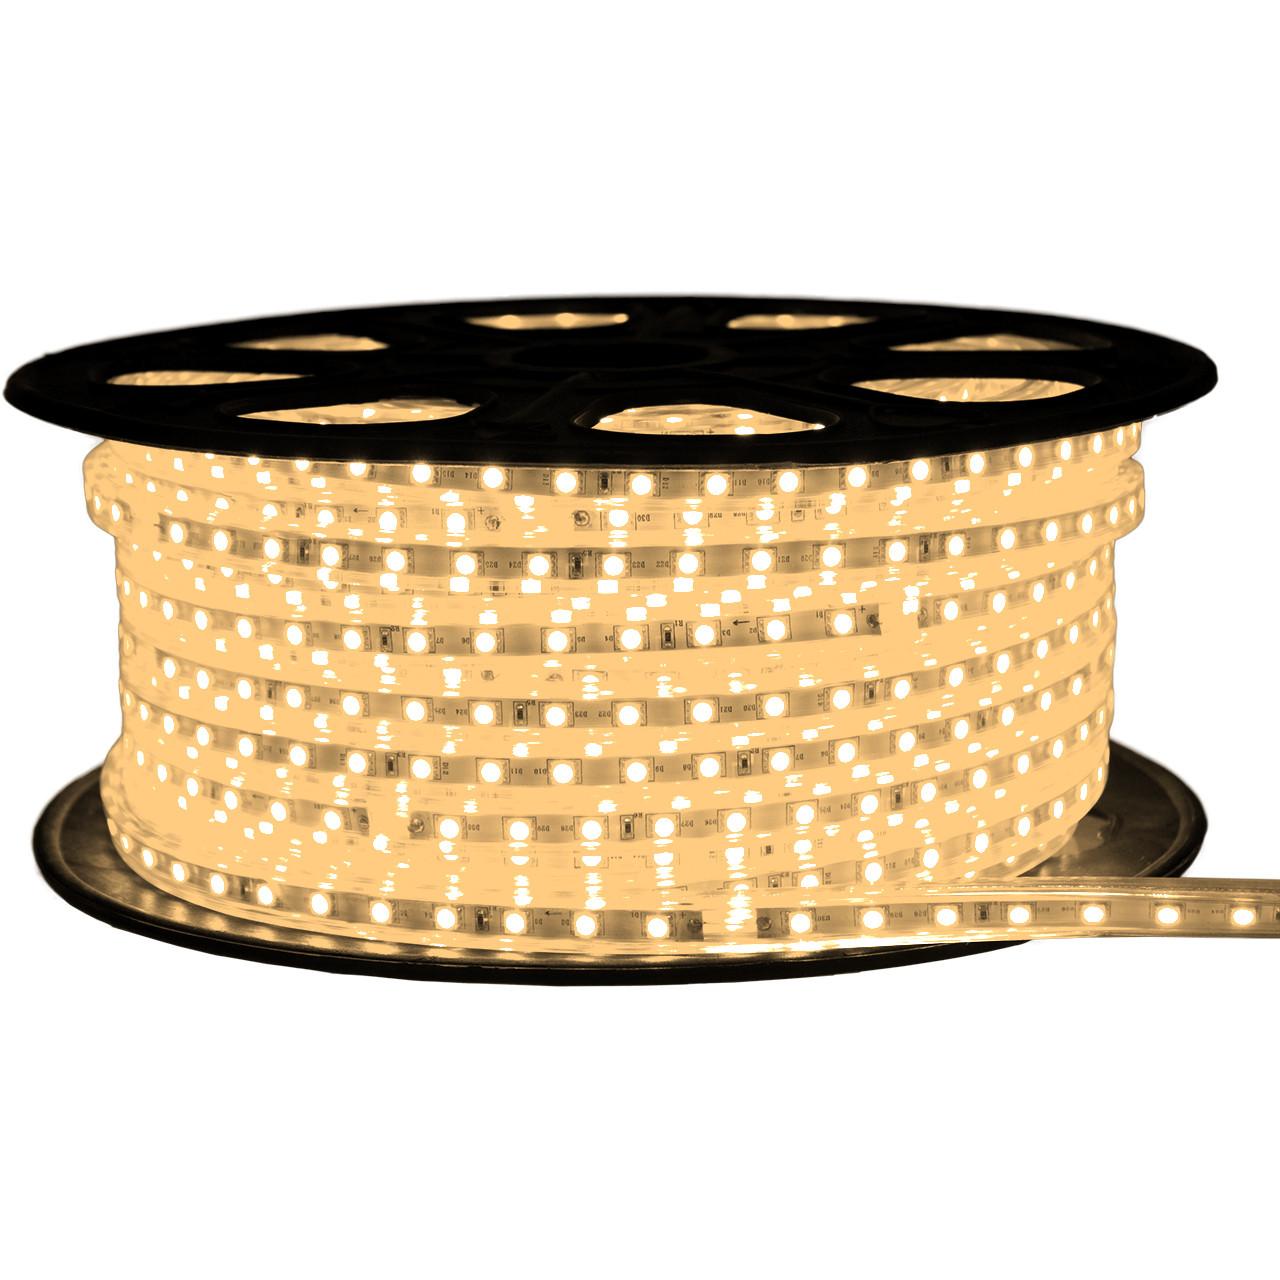 High Output Smd 5050: Warm White LED Strip Lights